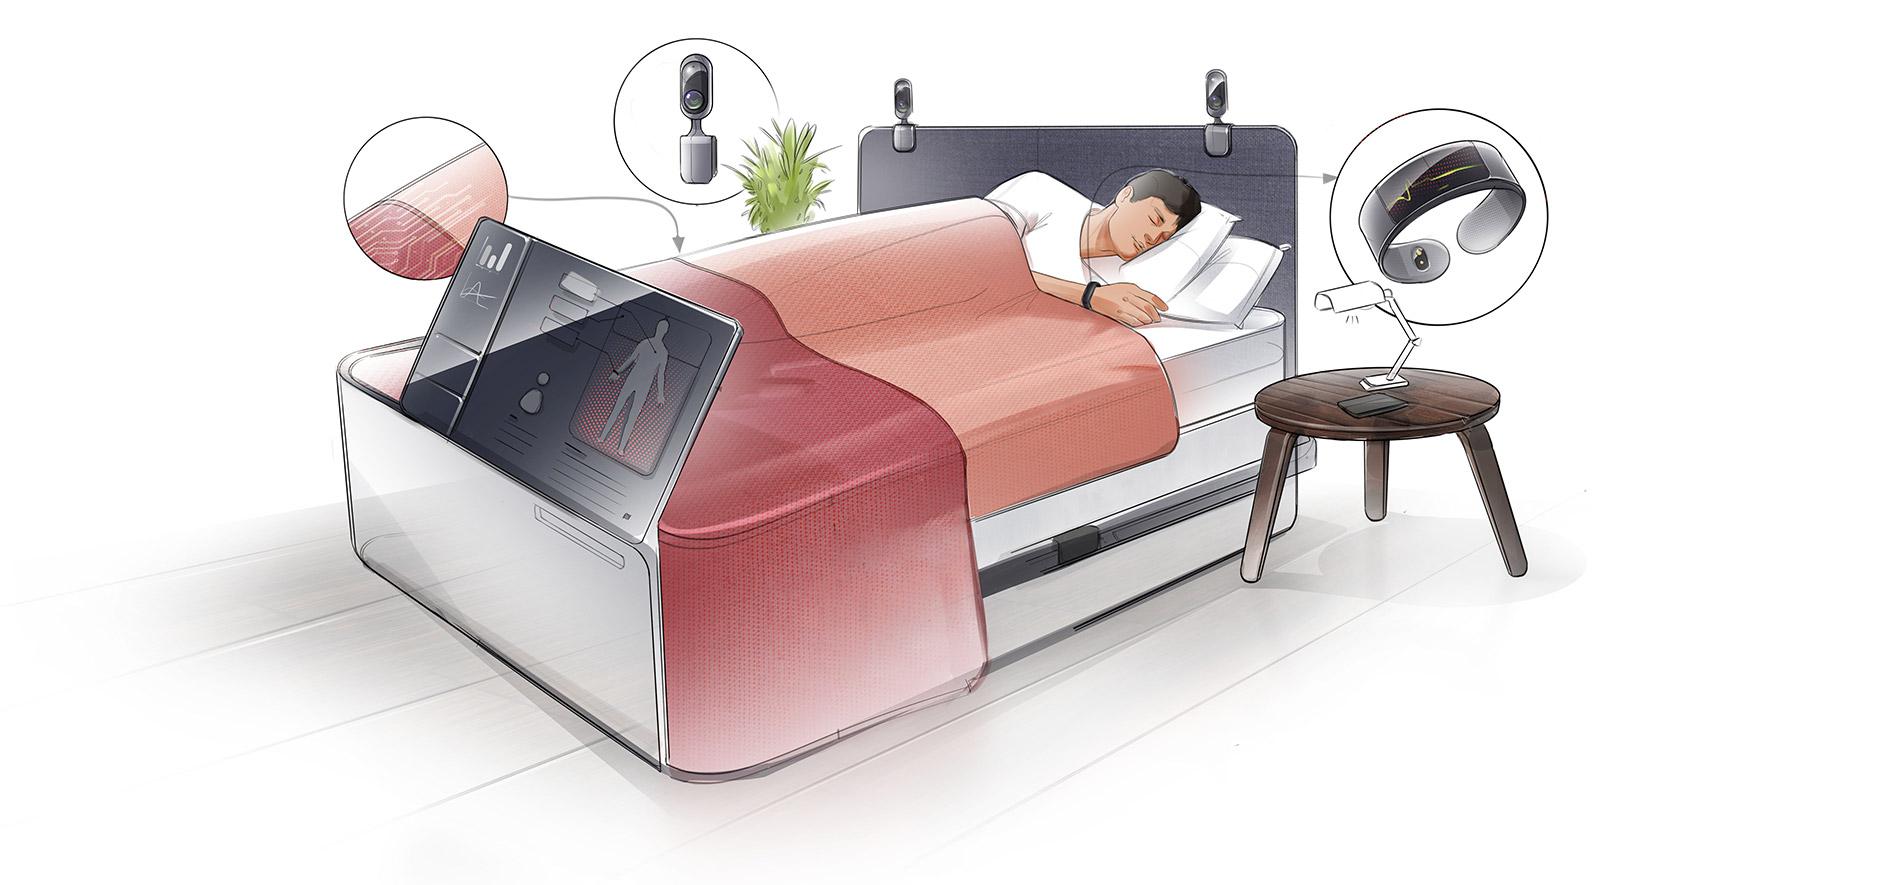 The Top Nursing Technologies Transforming Patient Care